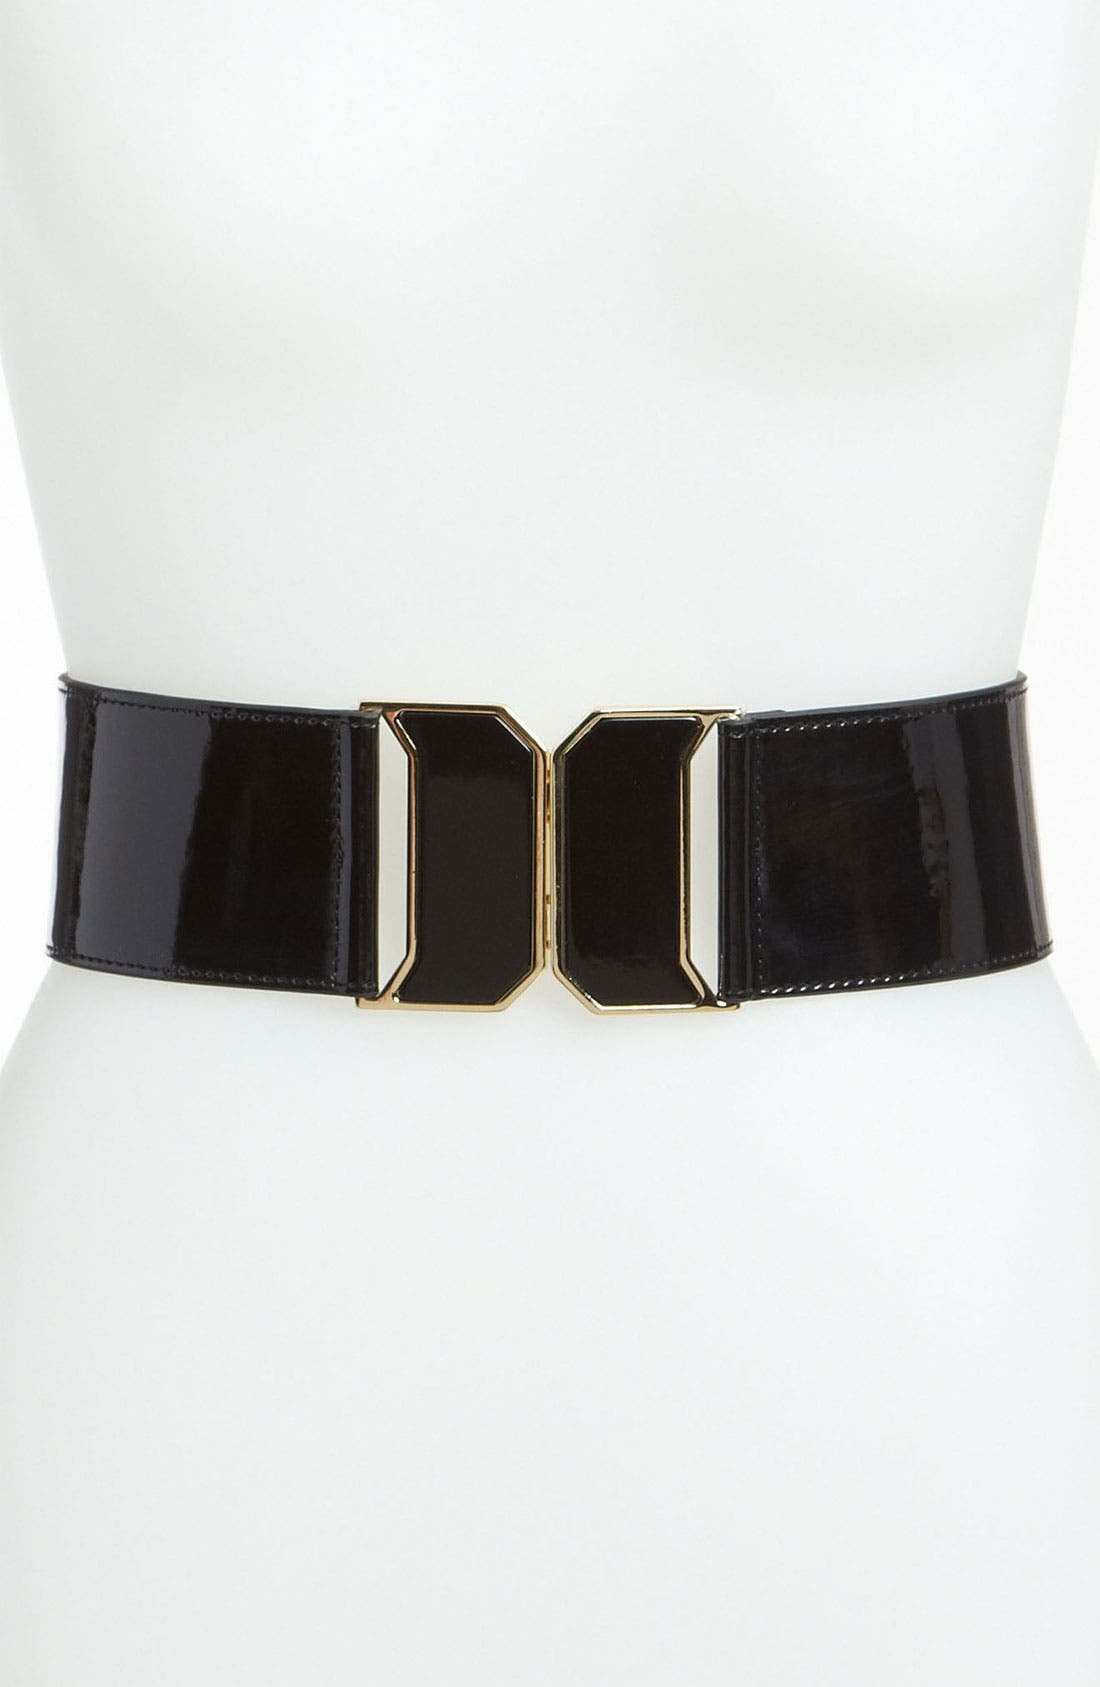 Alternate Image 1 Selected - Betsey Johnson 'Vintage Deco' Stretch Belt